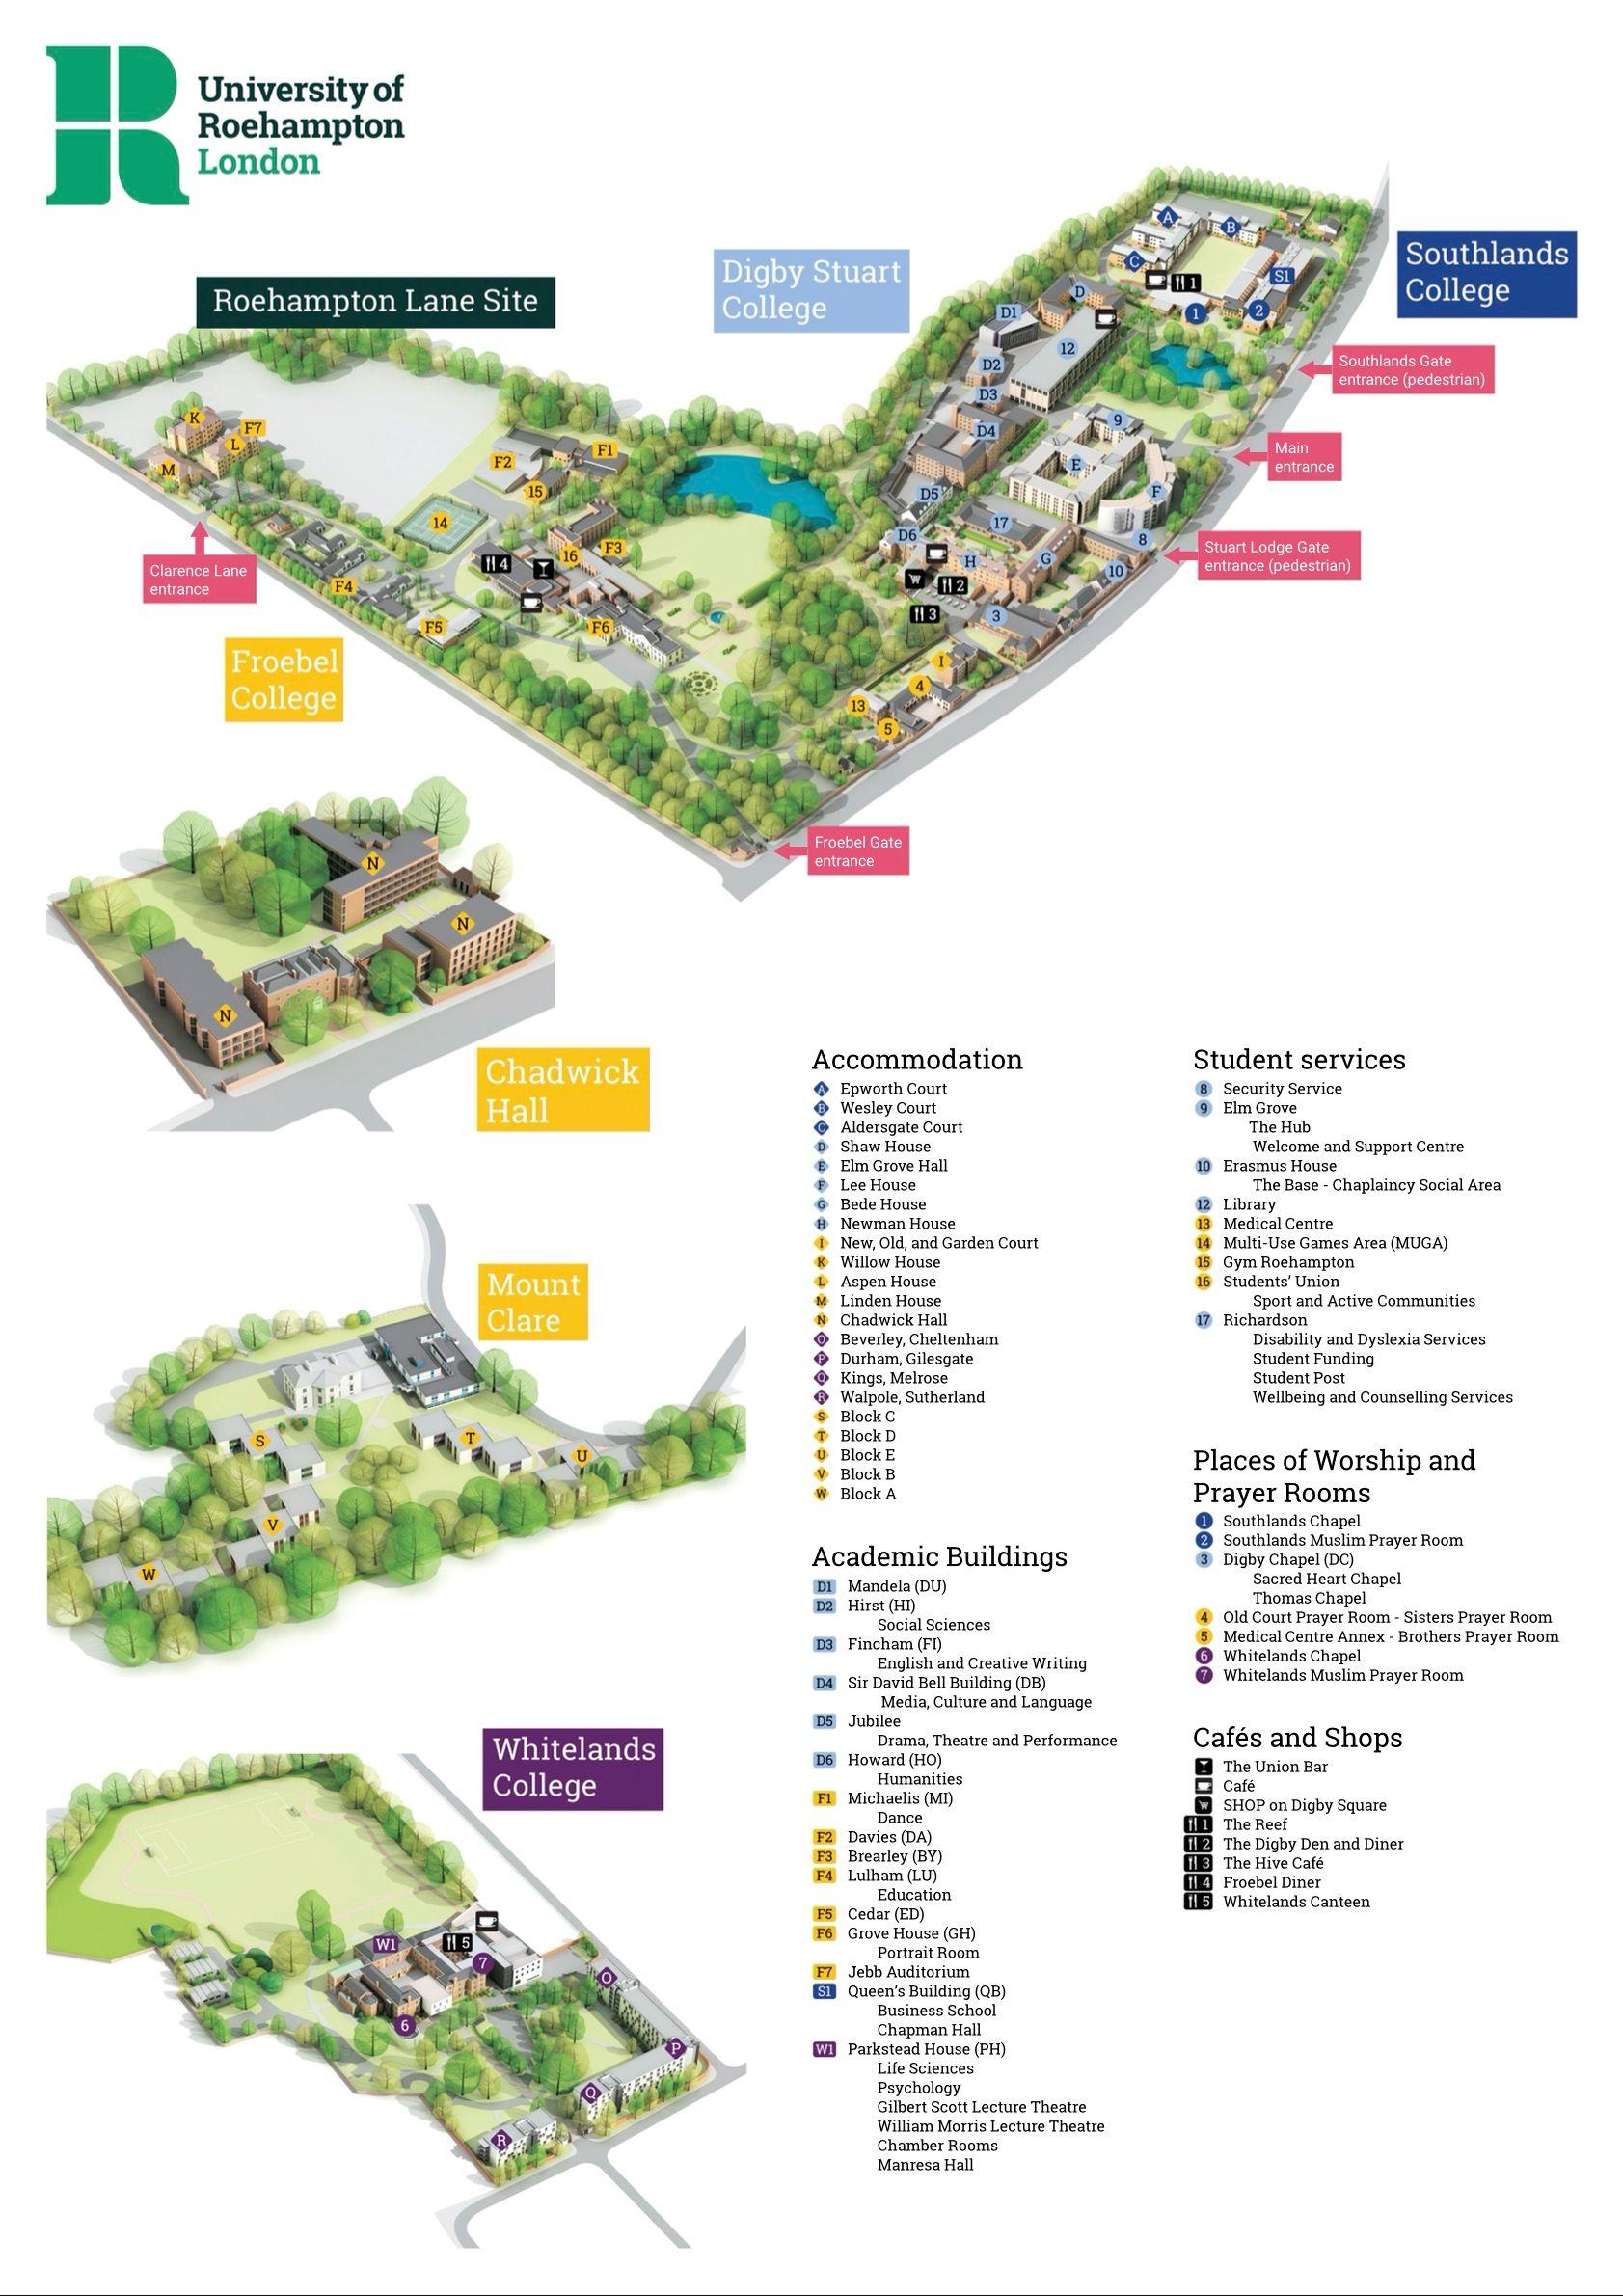 university of roehampton london